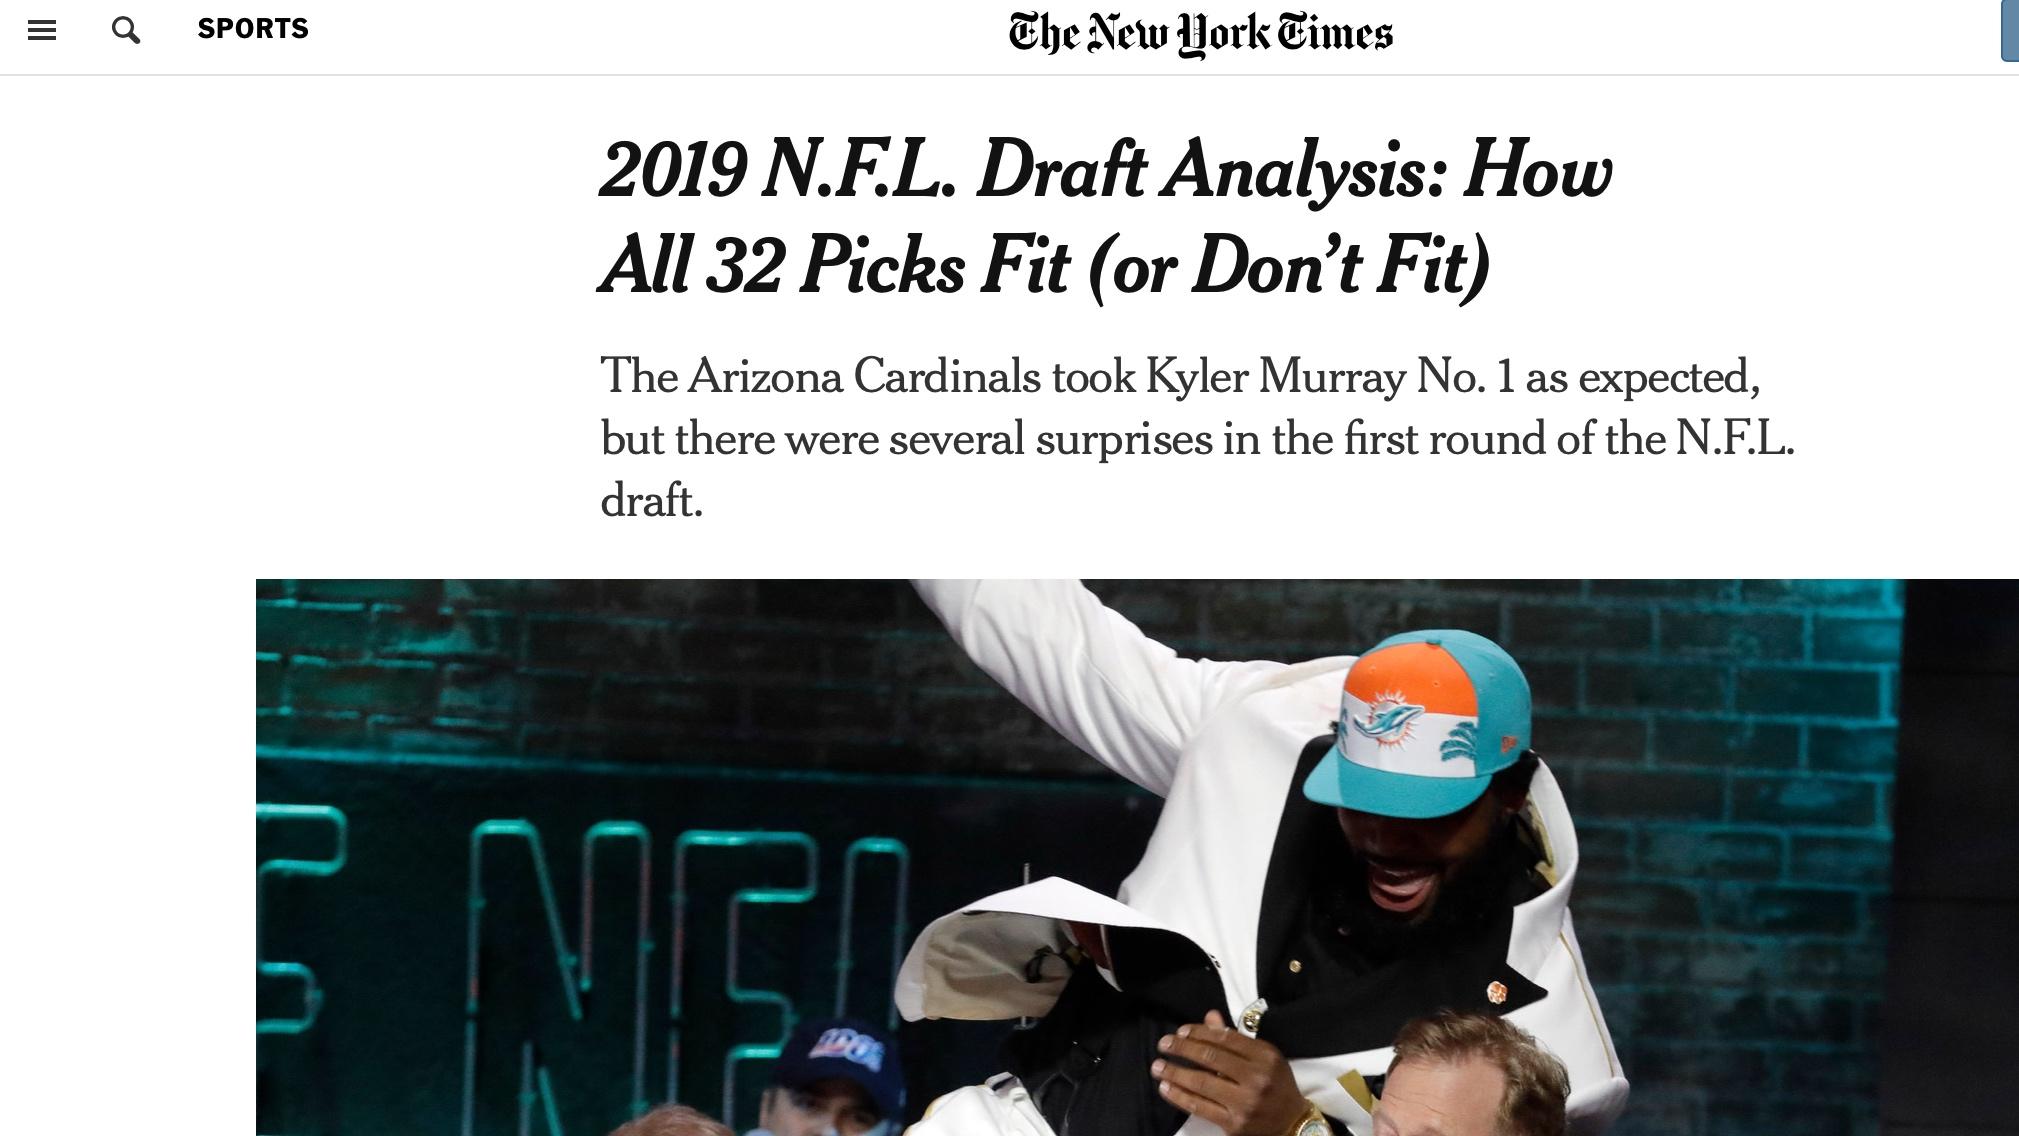 New York Times , April 25, 2019  https://www.nytimes.com/2019/04/26/sports/nfl-draft-new-york-giants-daniel-jones.html